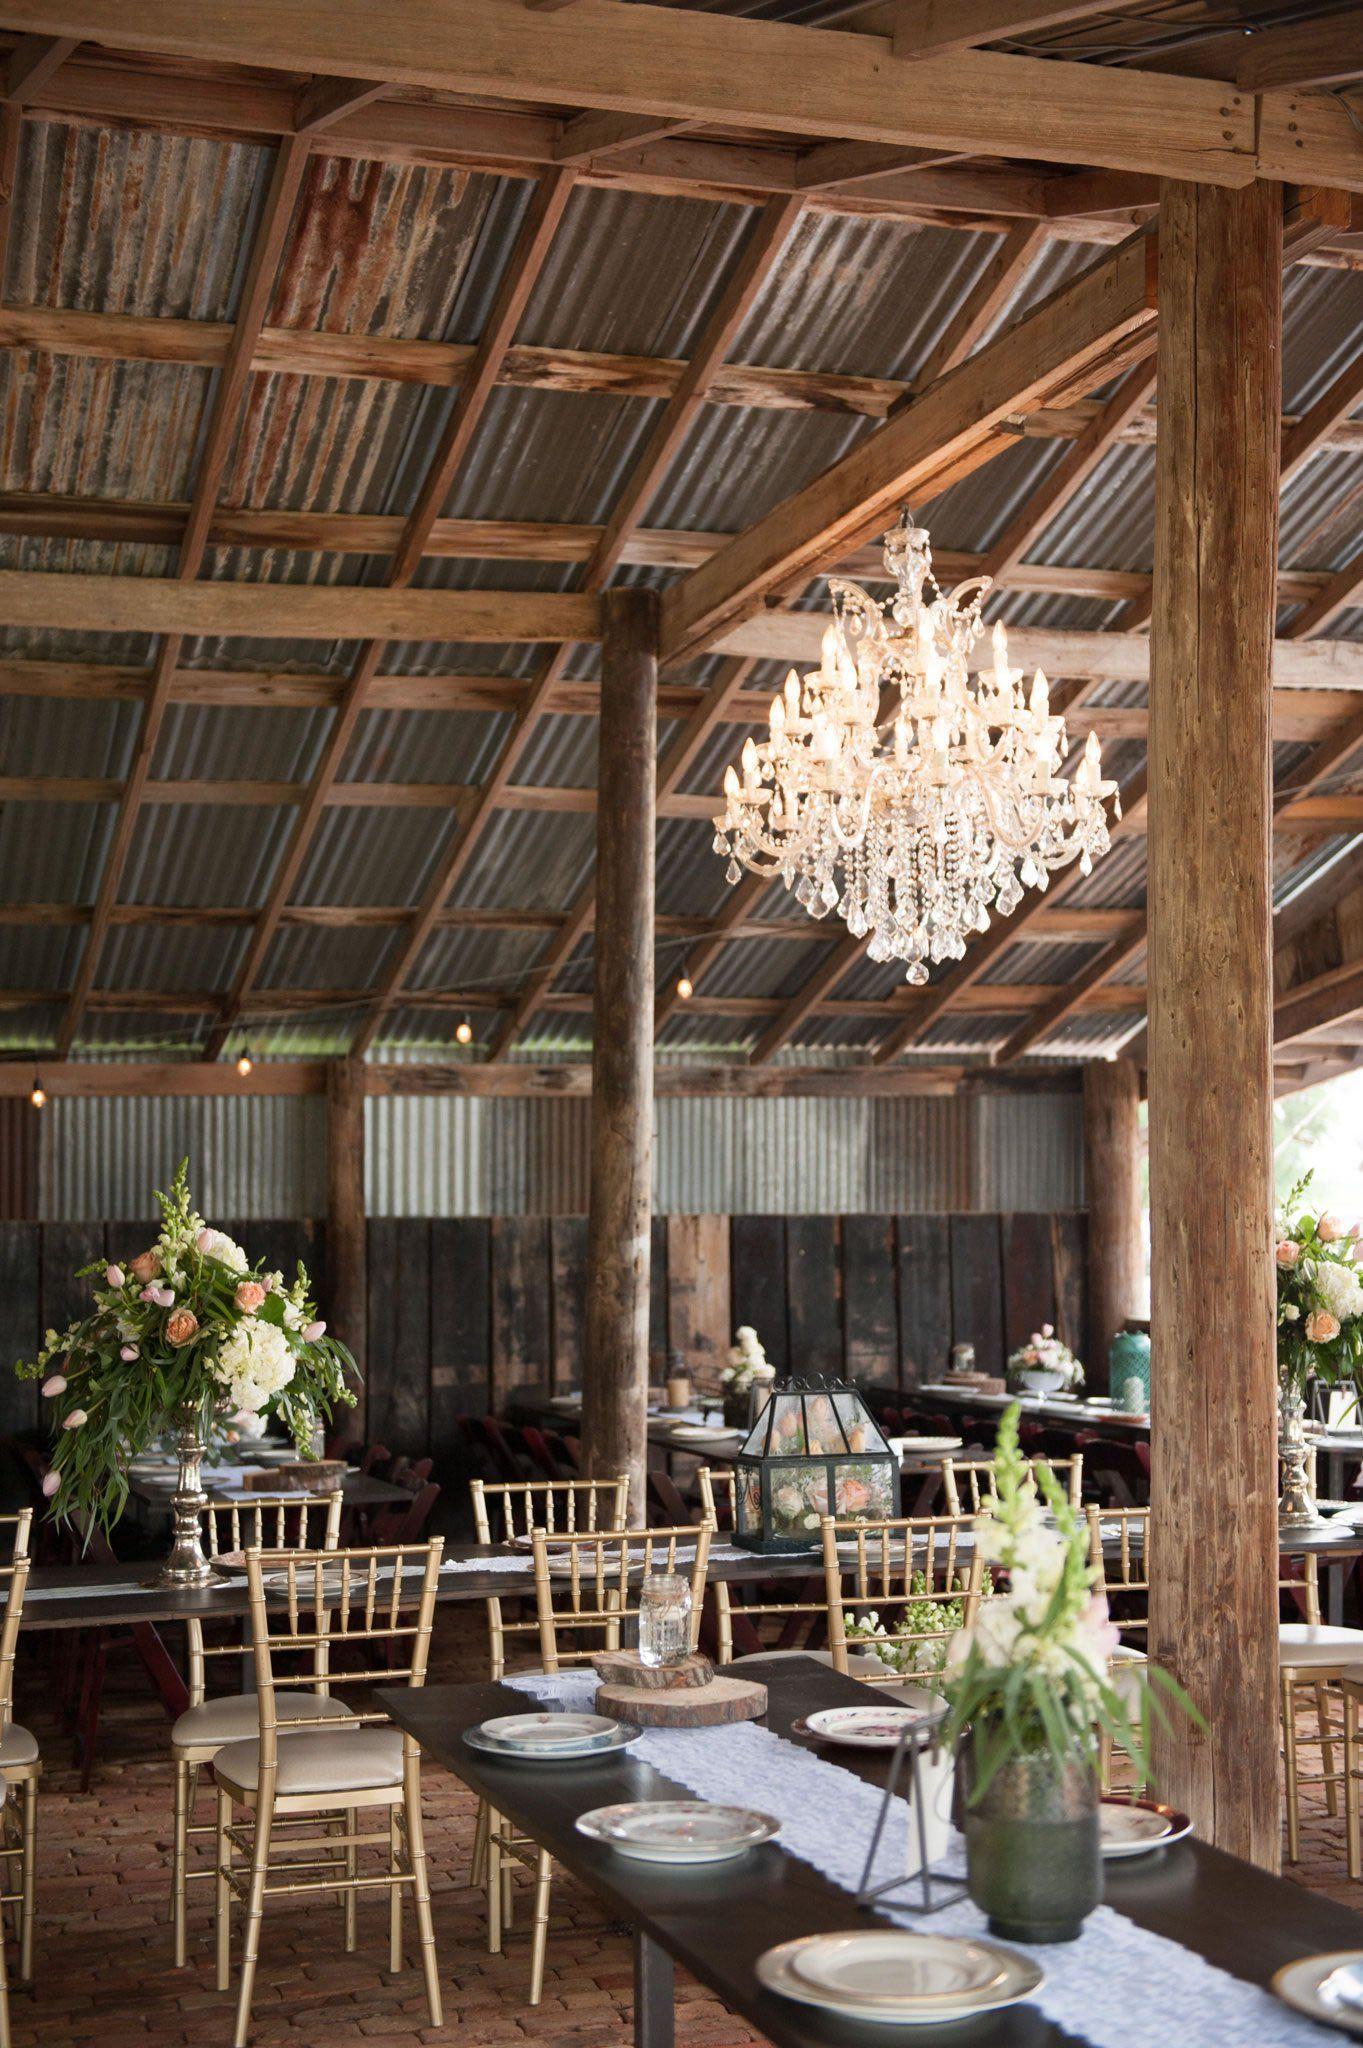 Glamorous Vintage Rustic Texas Barn Wedding Venue Cherokee Rose: Vintage Barn Wedding Venue At Websimilar.org